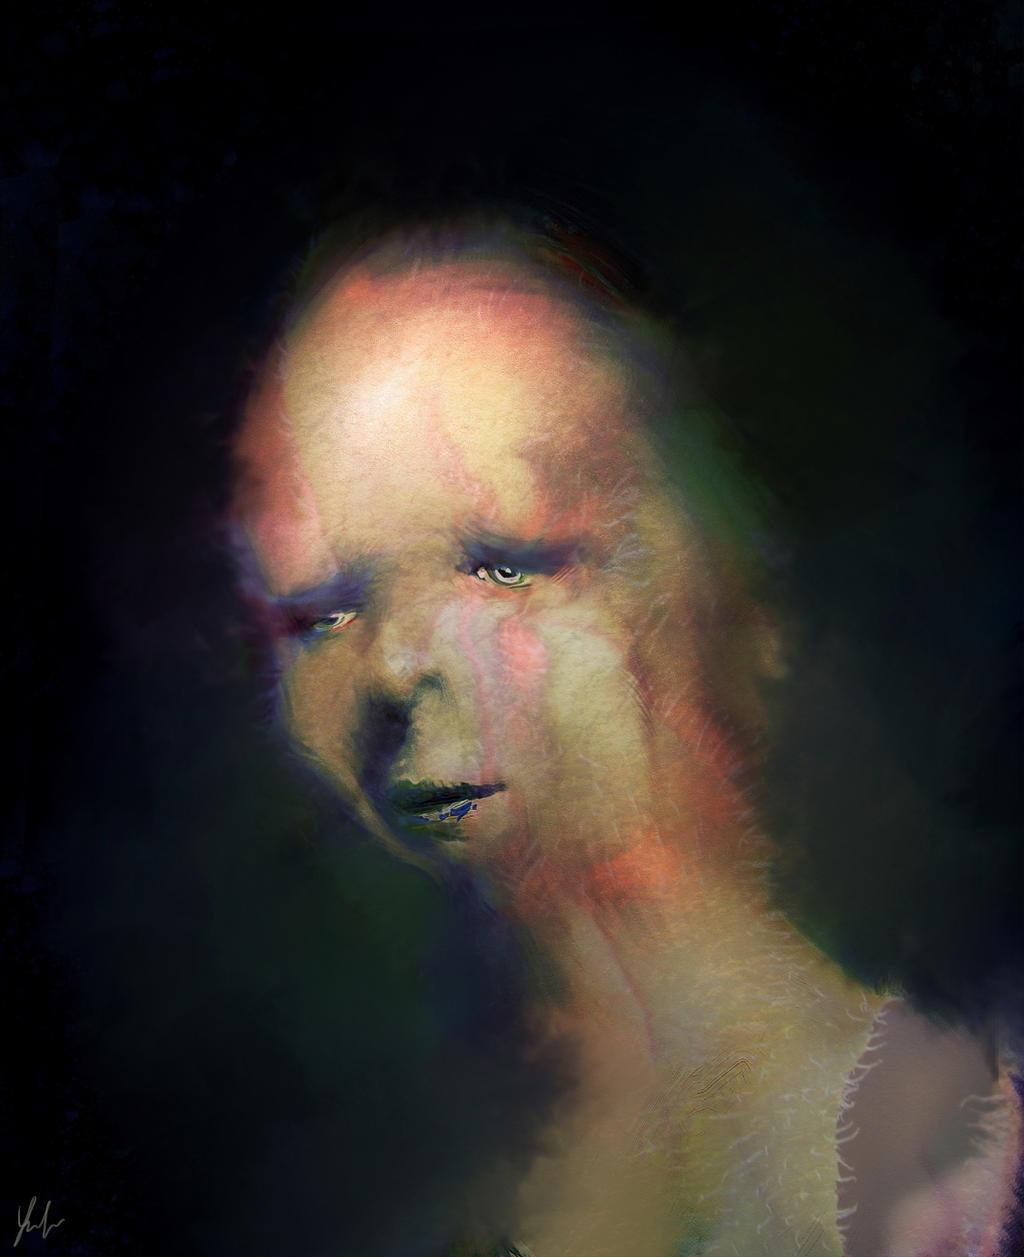 Weird Portrait by RedSaucers